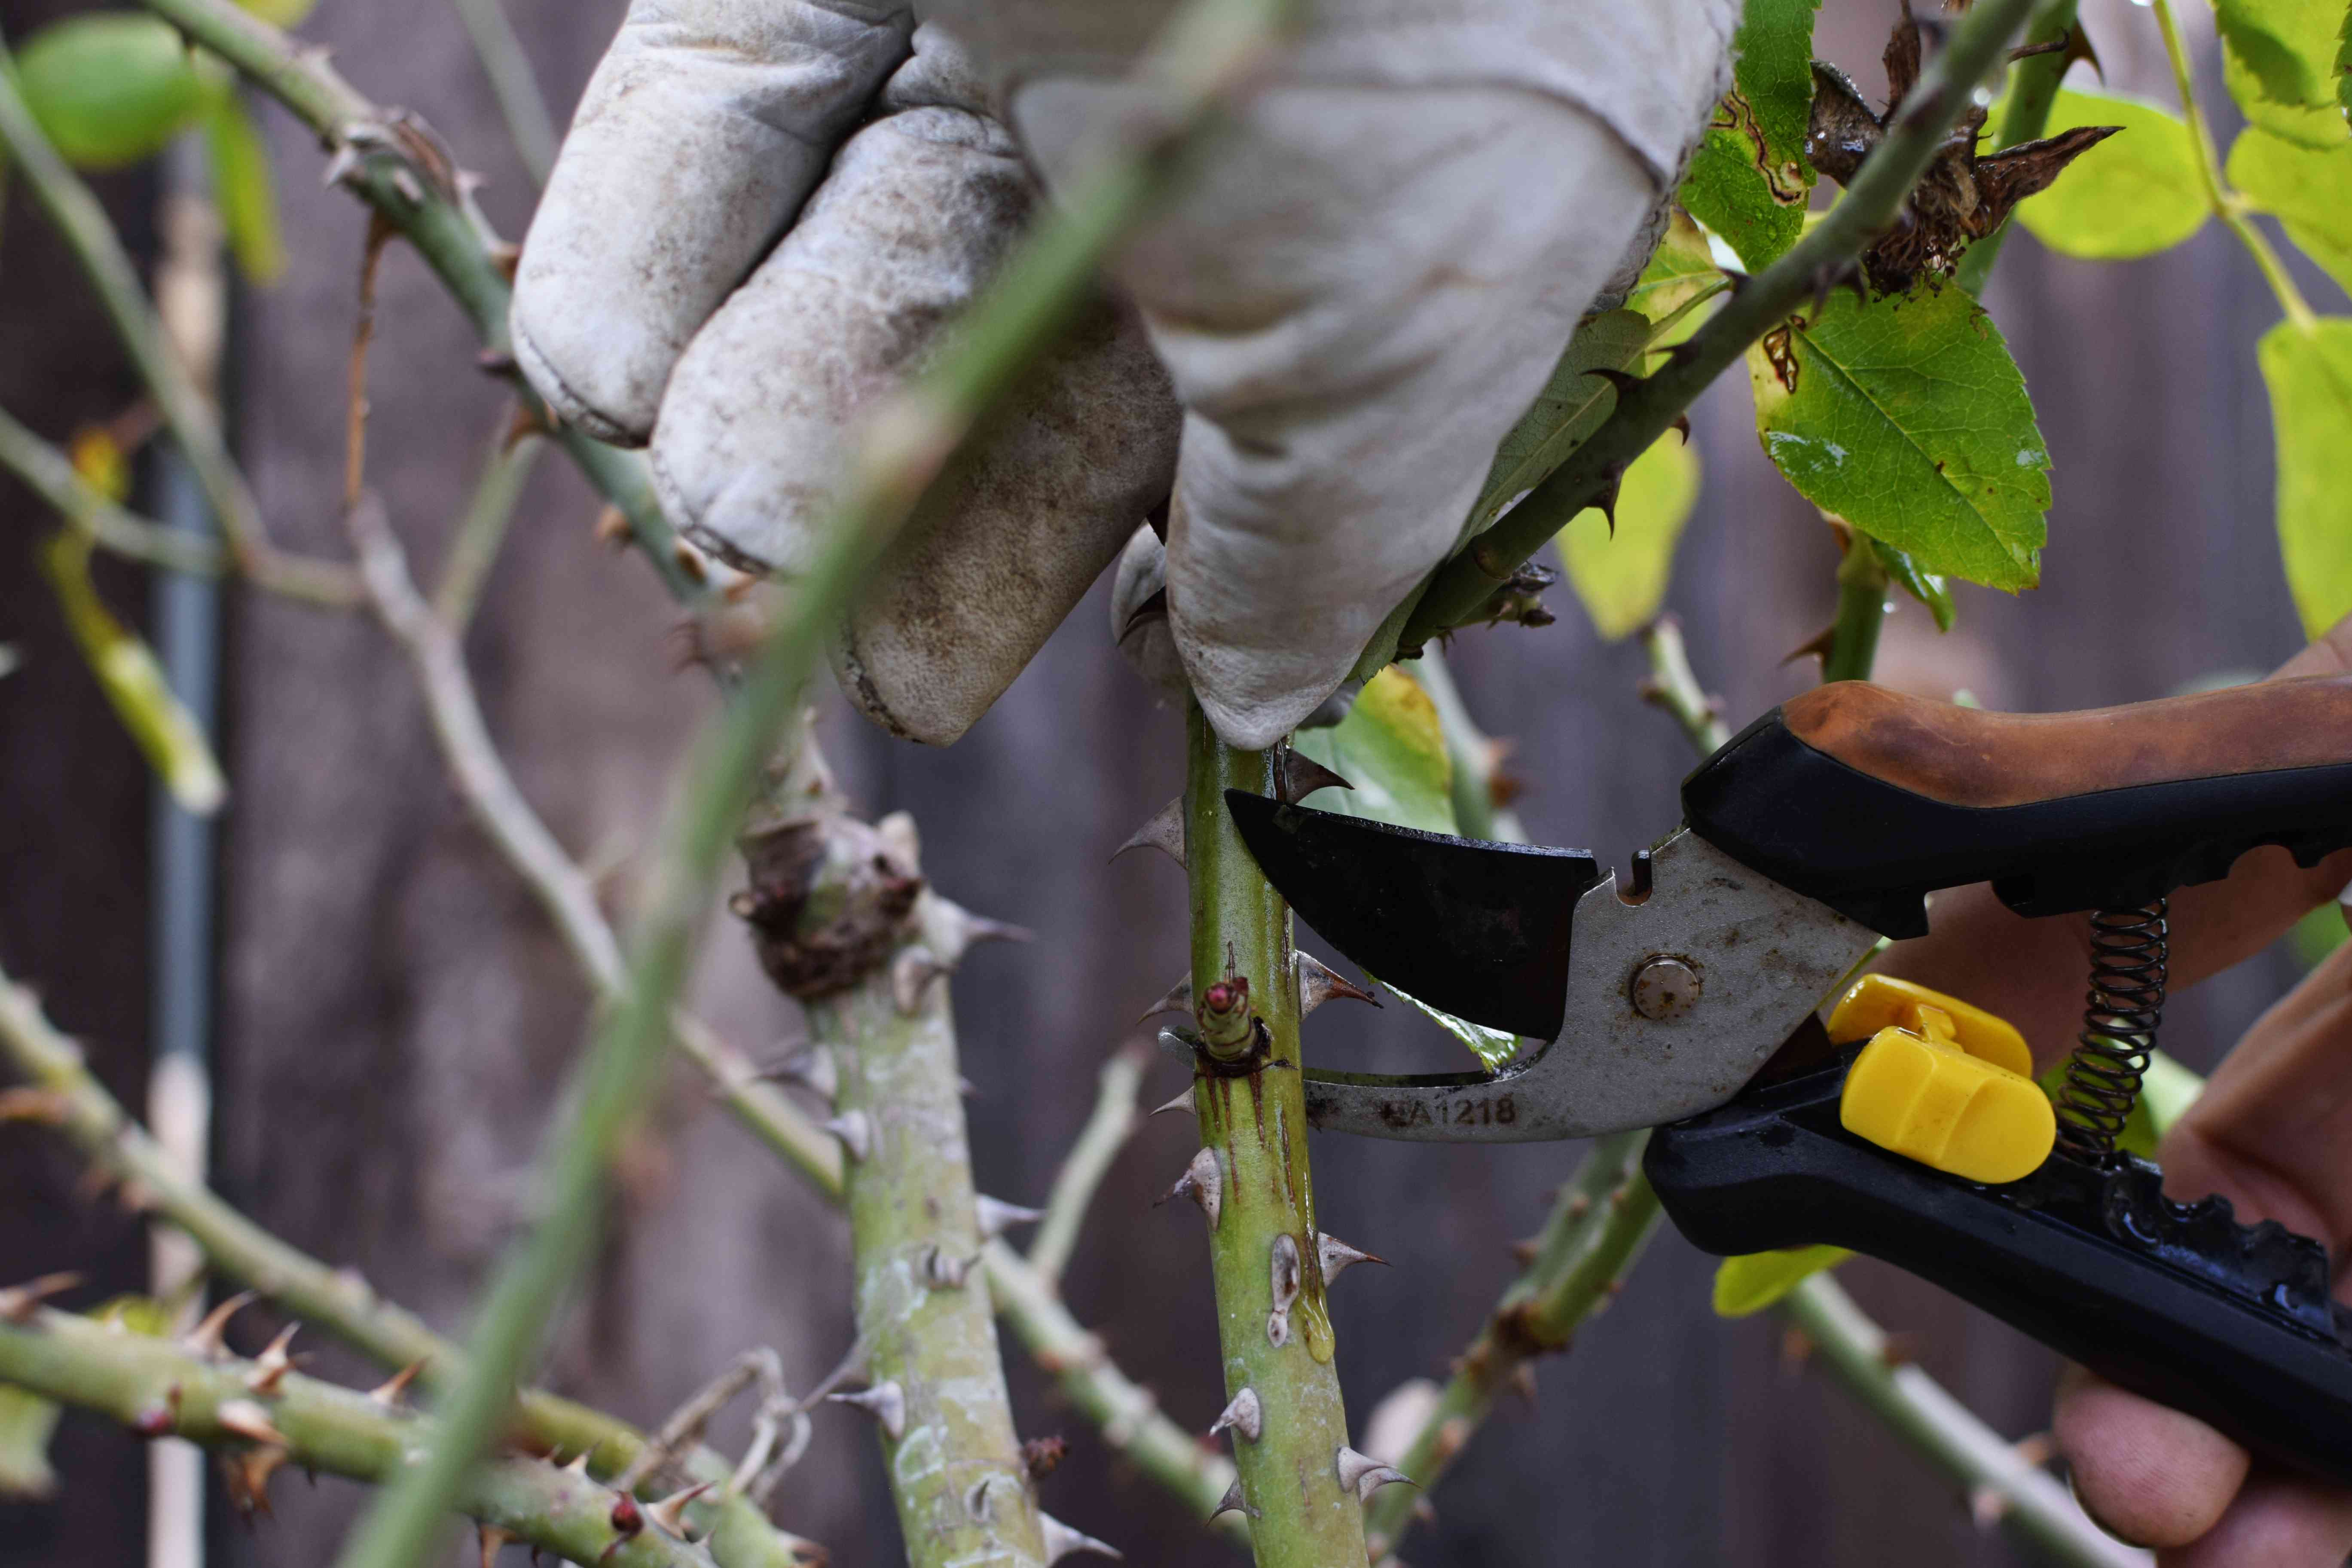 Rose stems pruned bu sharp pruner for spring growth